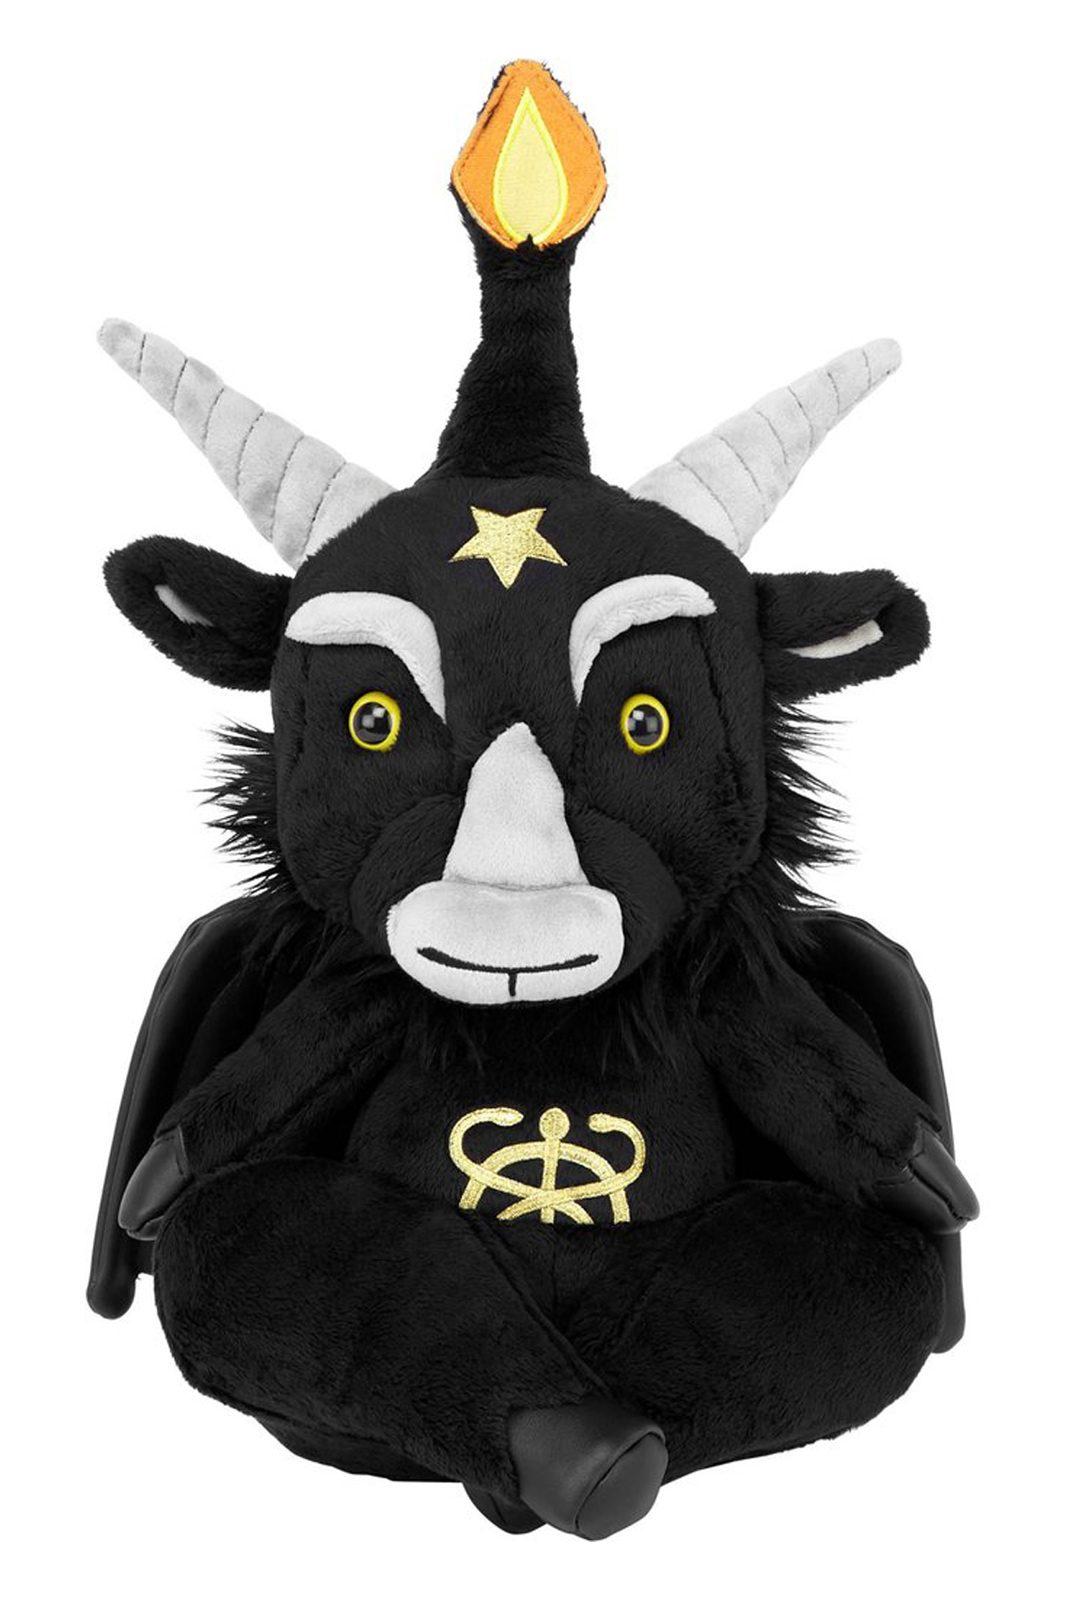 Dark Lord Plush Toy